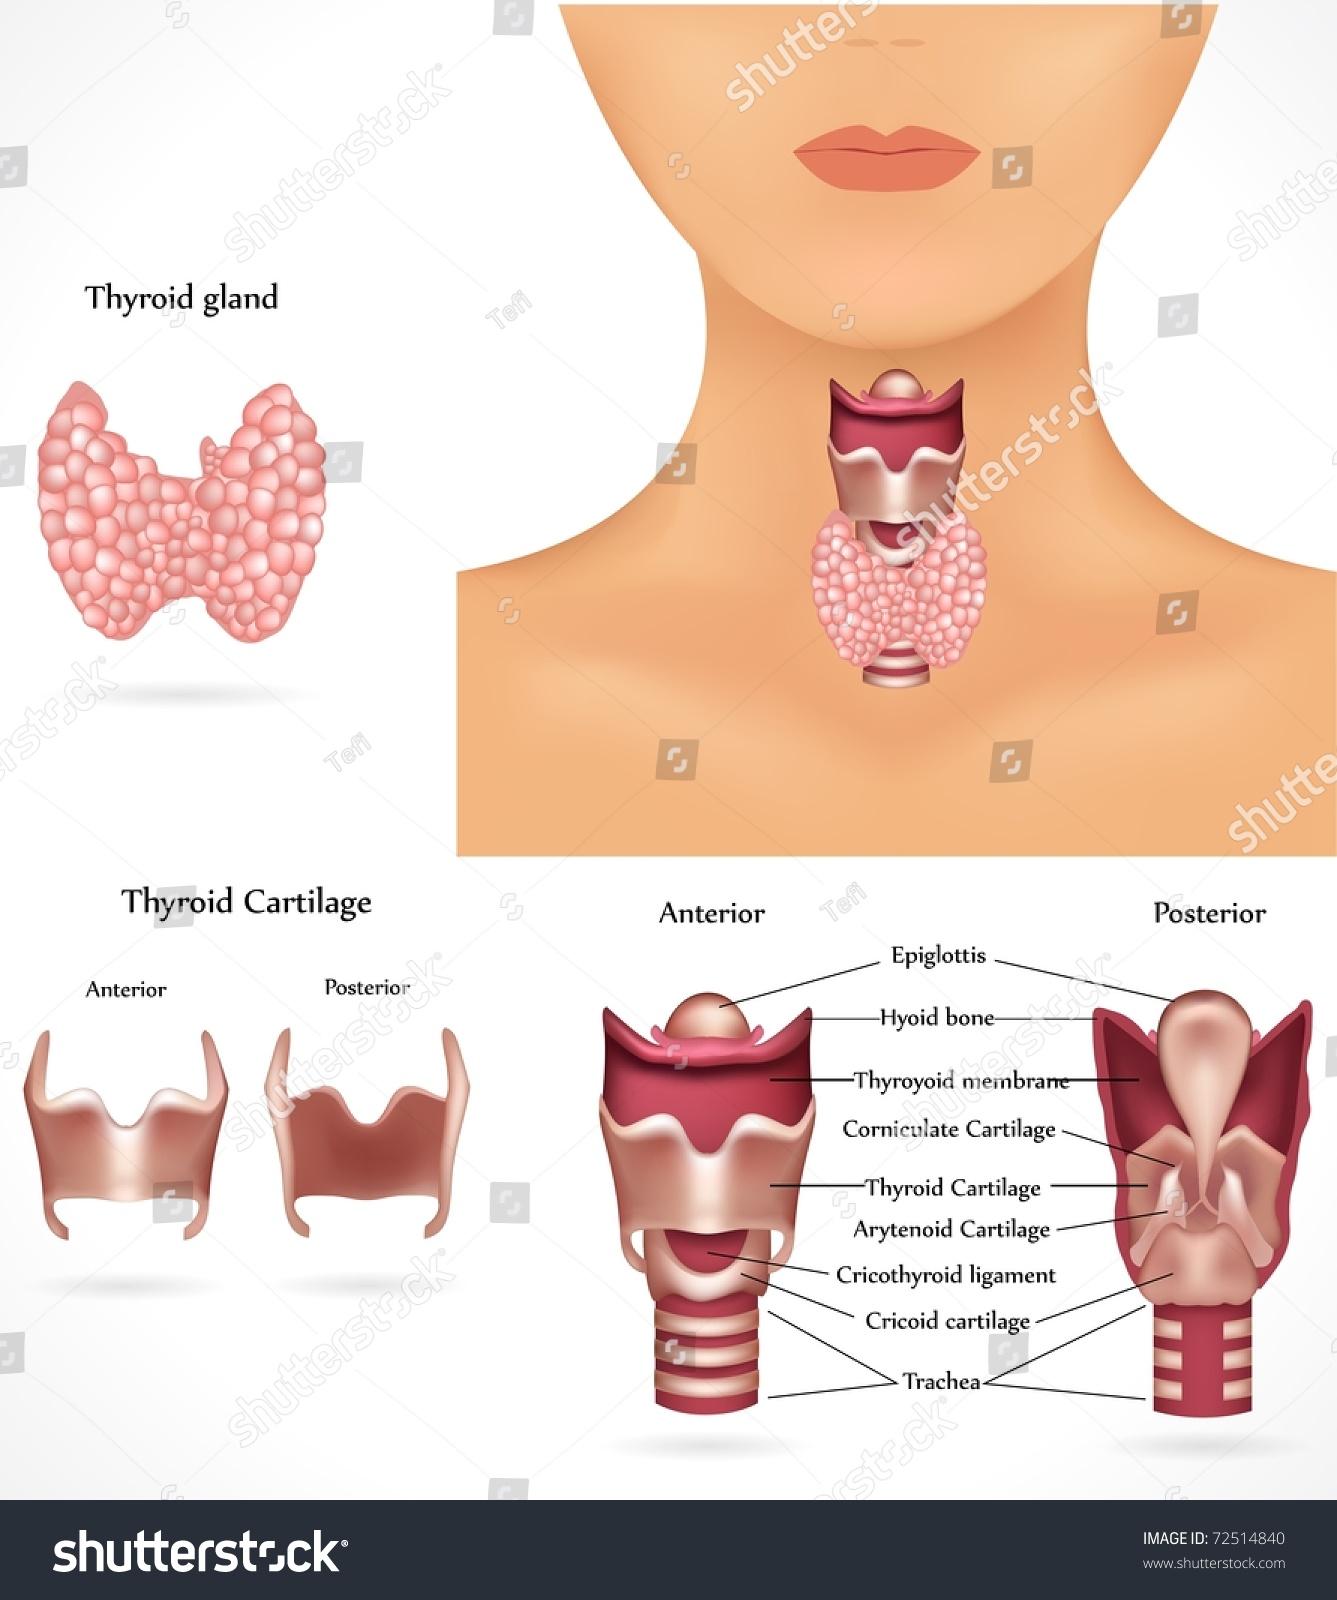 Thyroid Gland Epiglottis Trachea Detailed Anatomy Stock Illustration ...